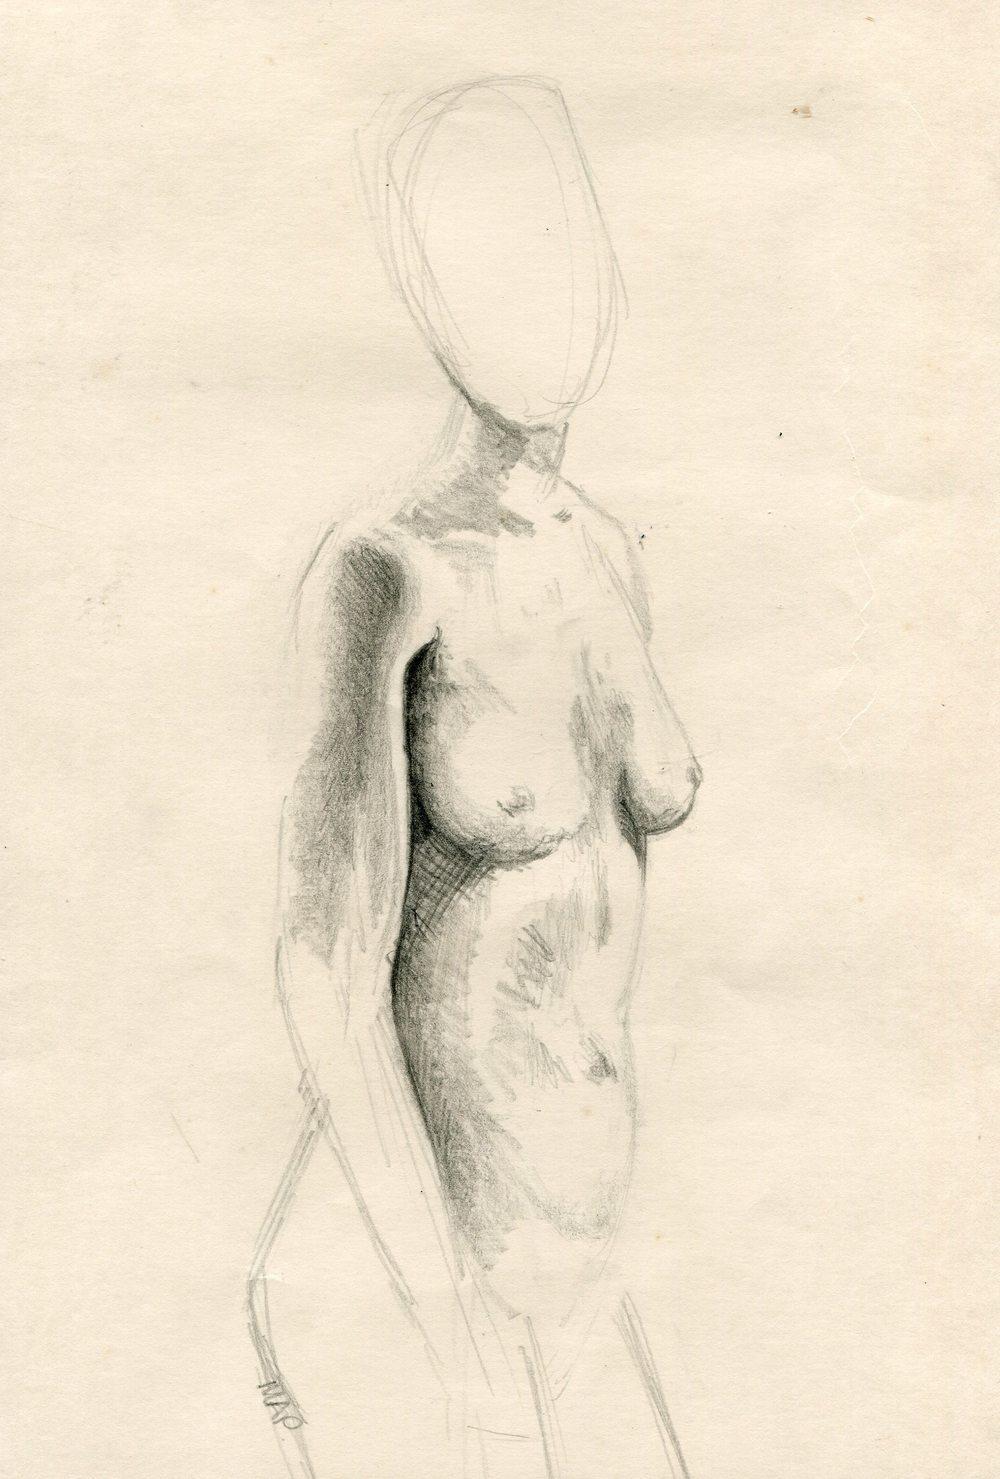 80b Pattenden, Marilyn - Nude, Pencil on paper..jpg